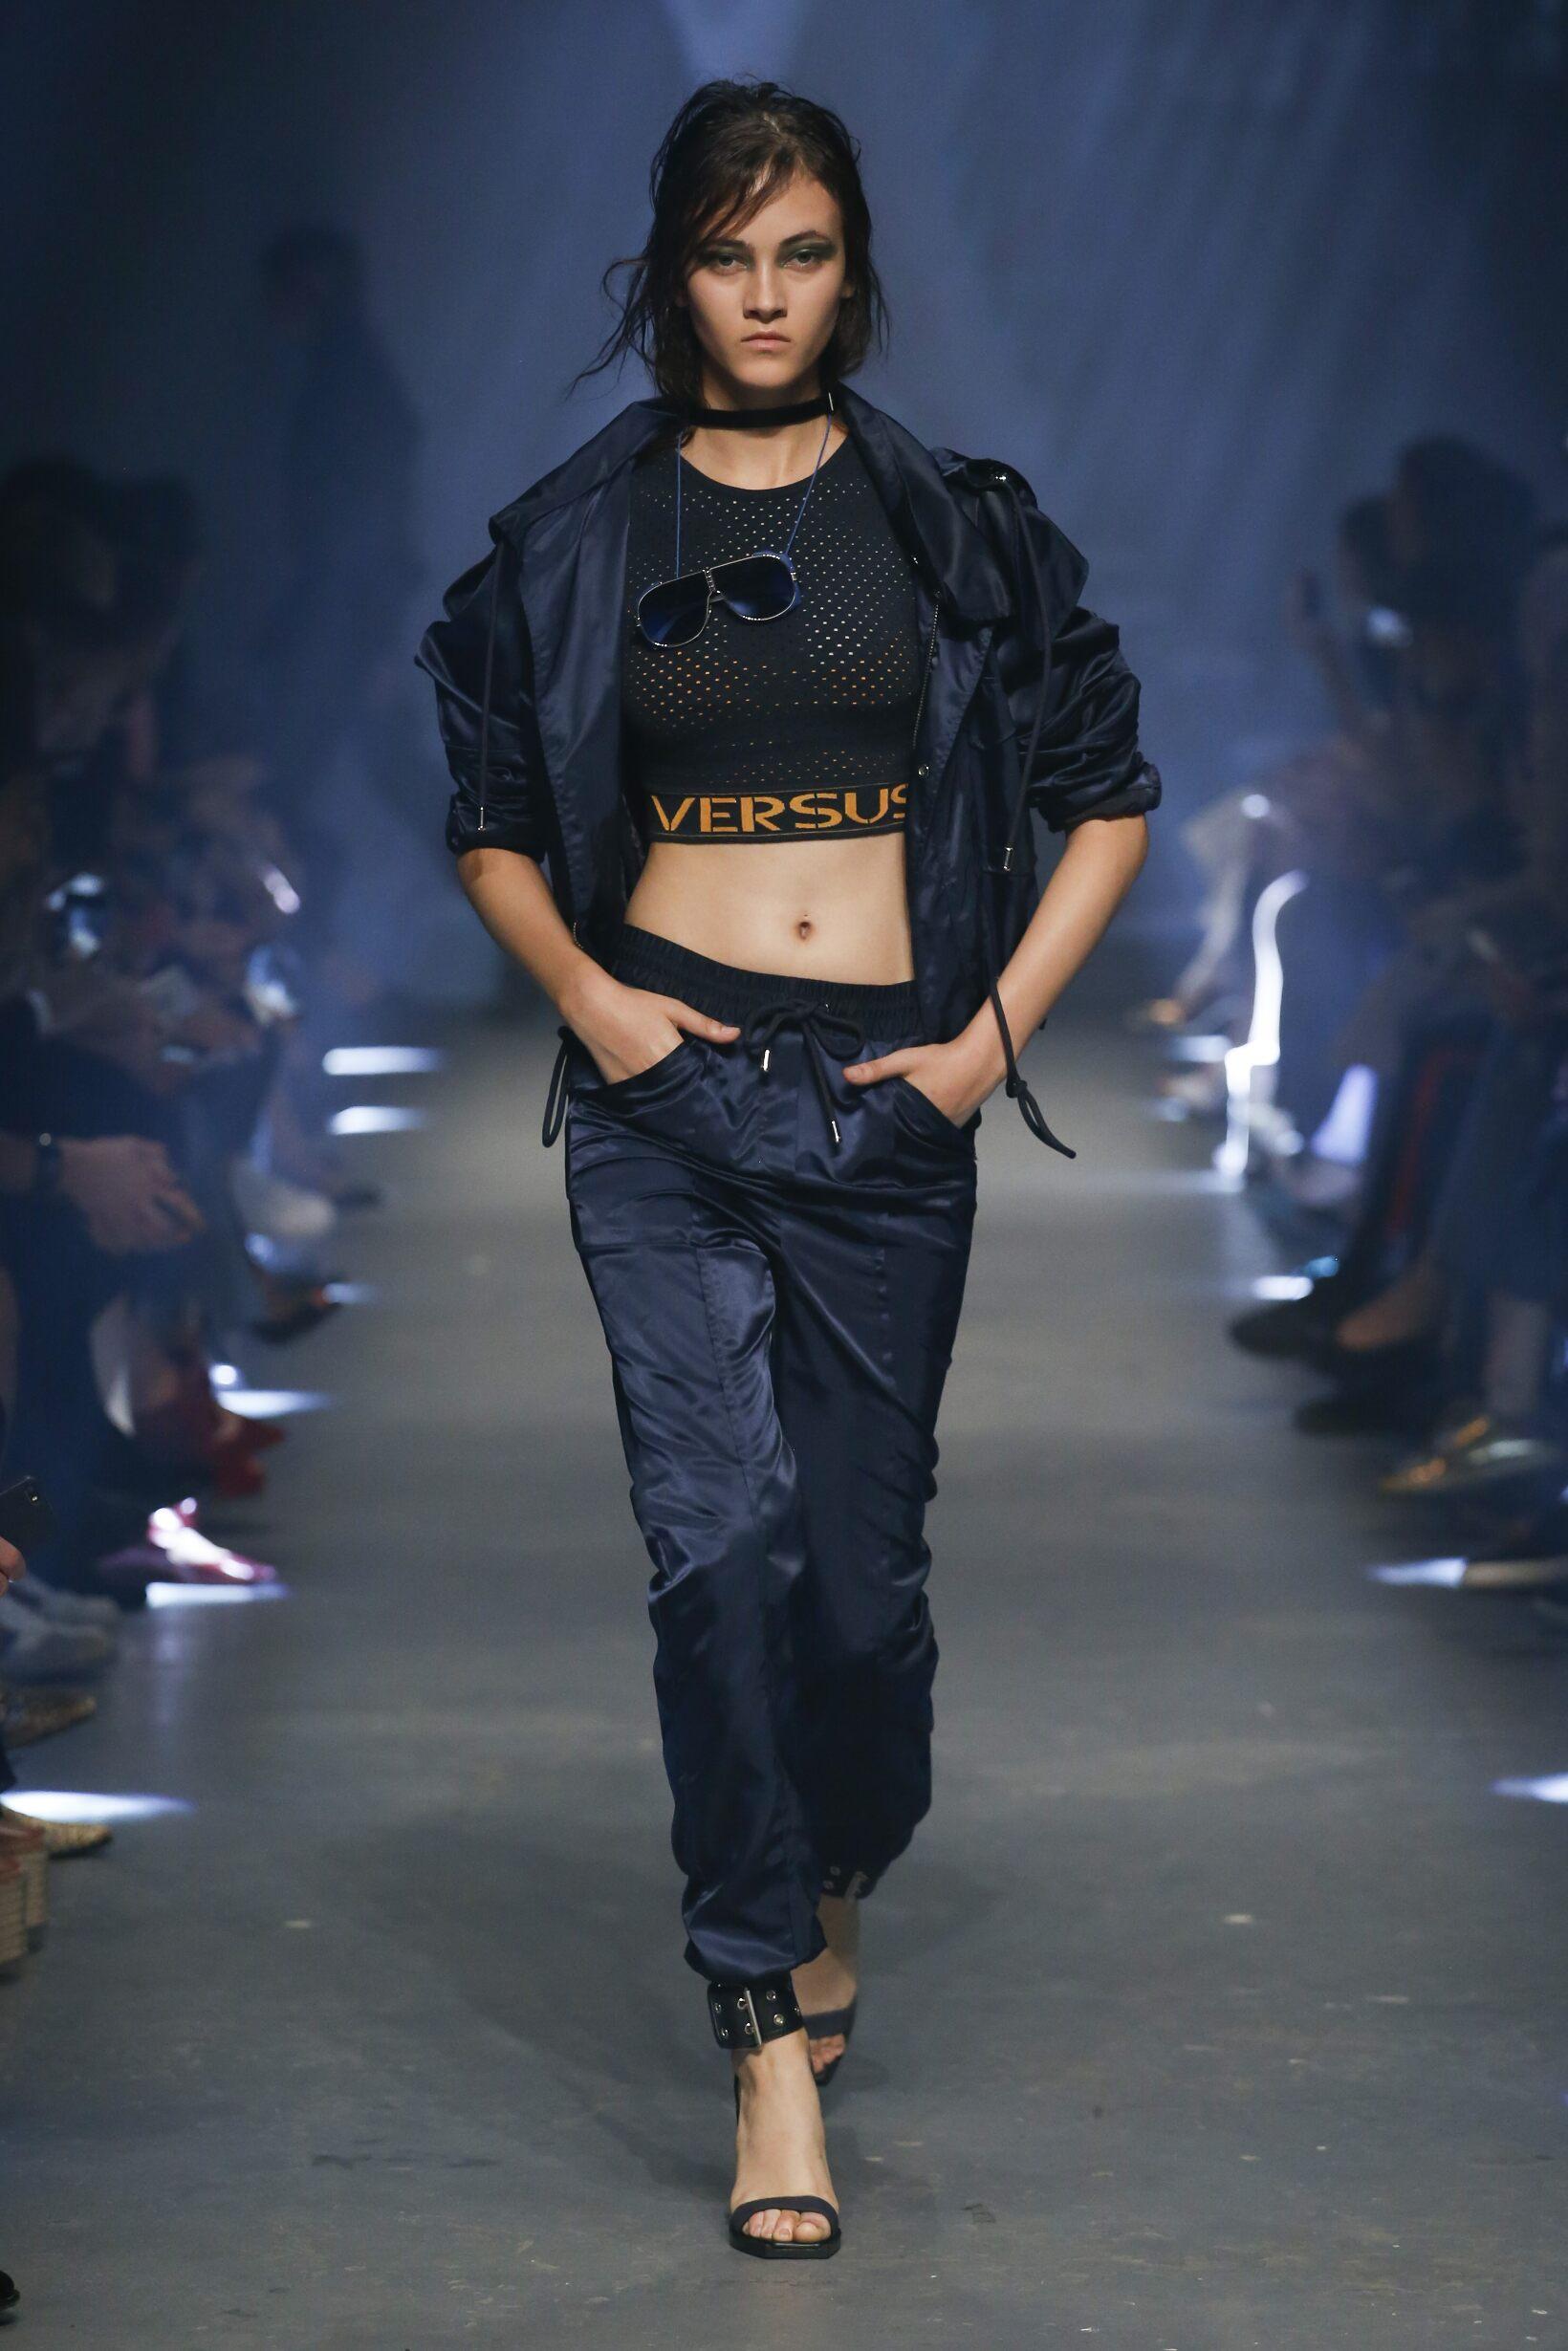 39dee866ef4c8 Catwalk Versus Versace Woman Fashion Show ...